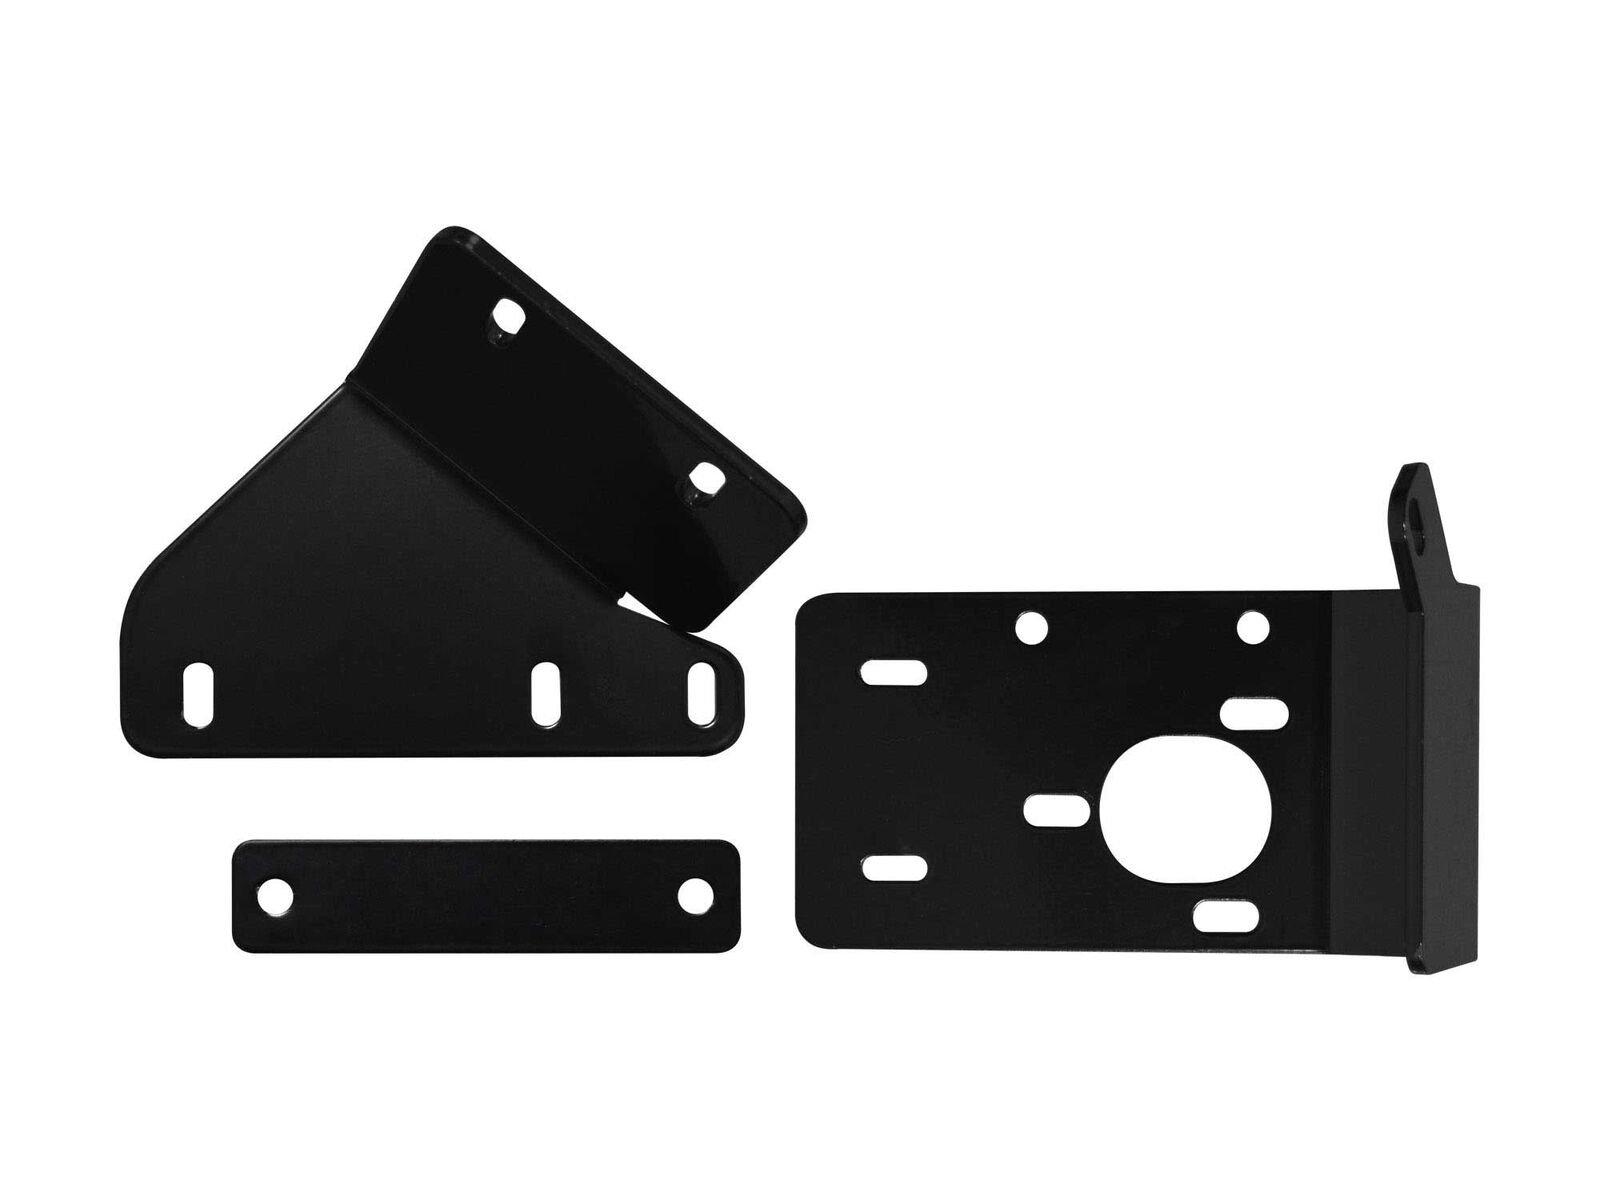 SuperATV EZ-STEER Power Steering Kit for Polaris RZR XP 900 (2011-2014)